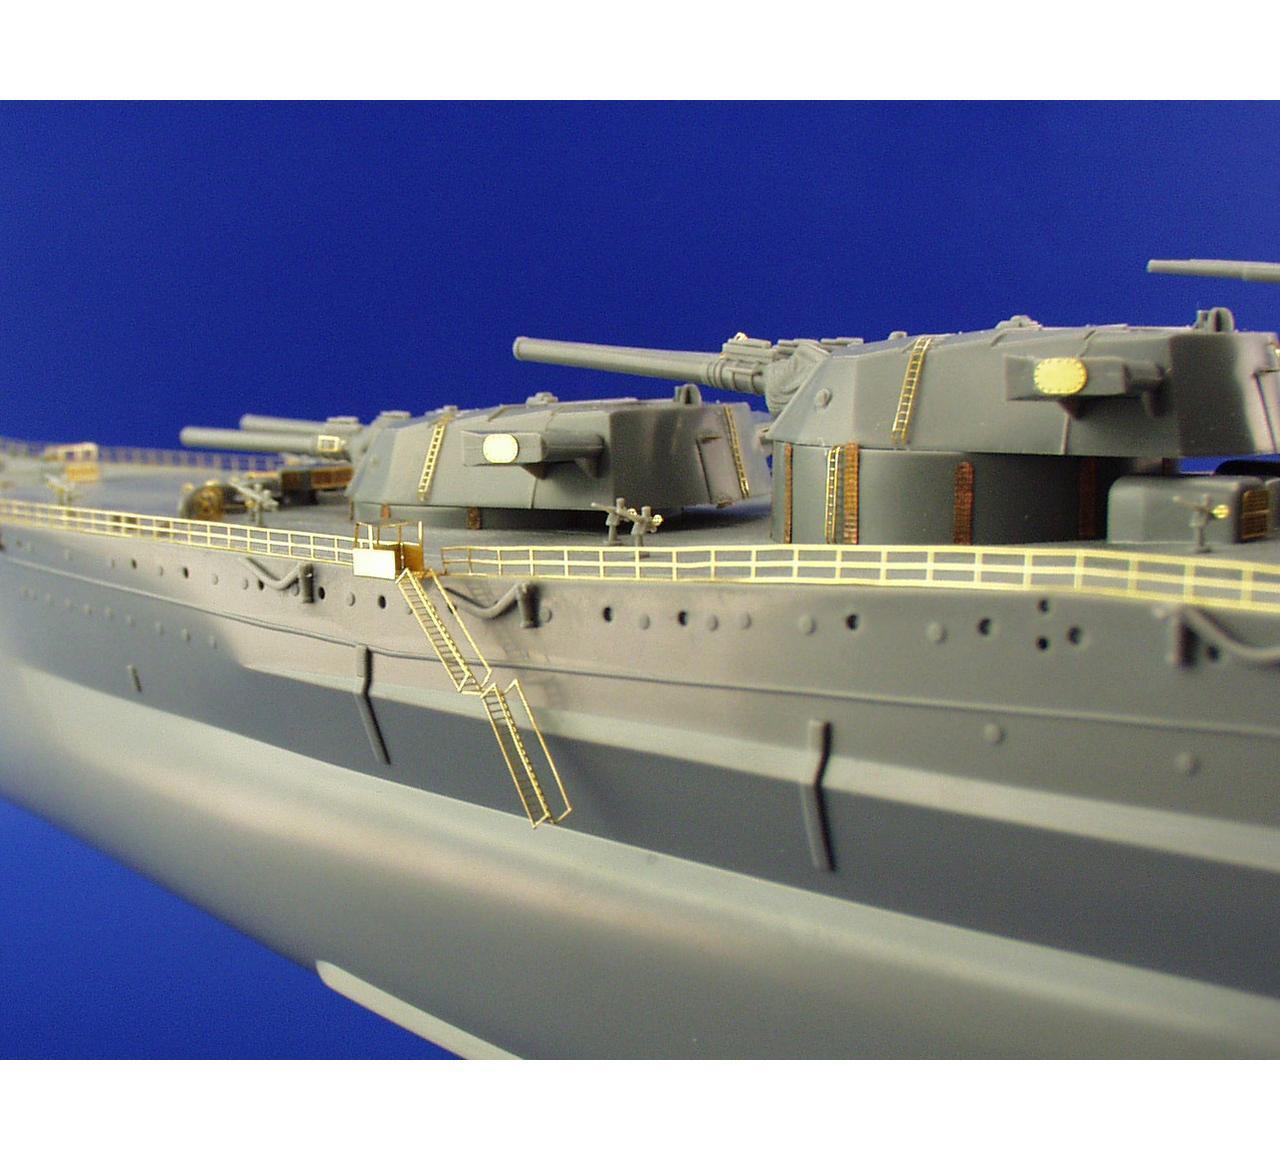 Eduard 53134 1 350 Ship- Musashi Railings detail set for Tamiya